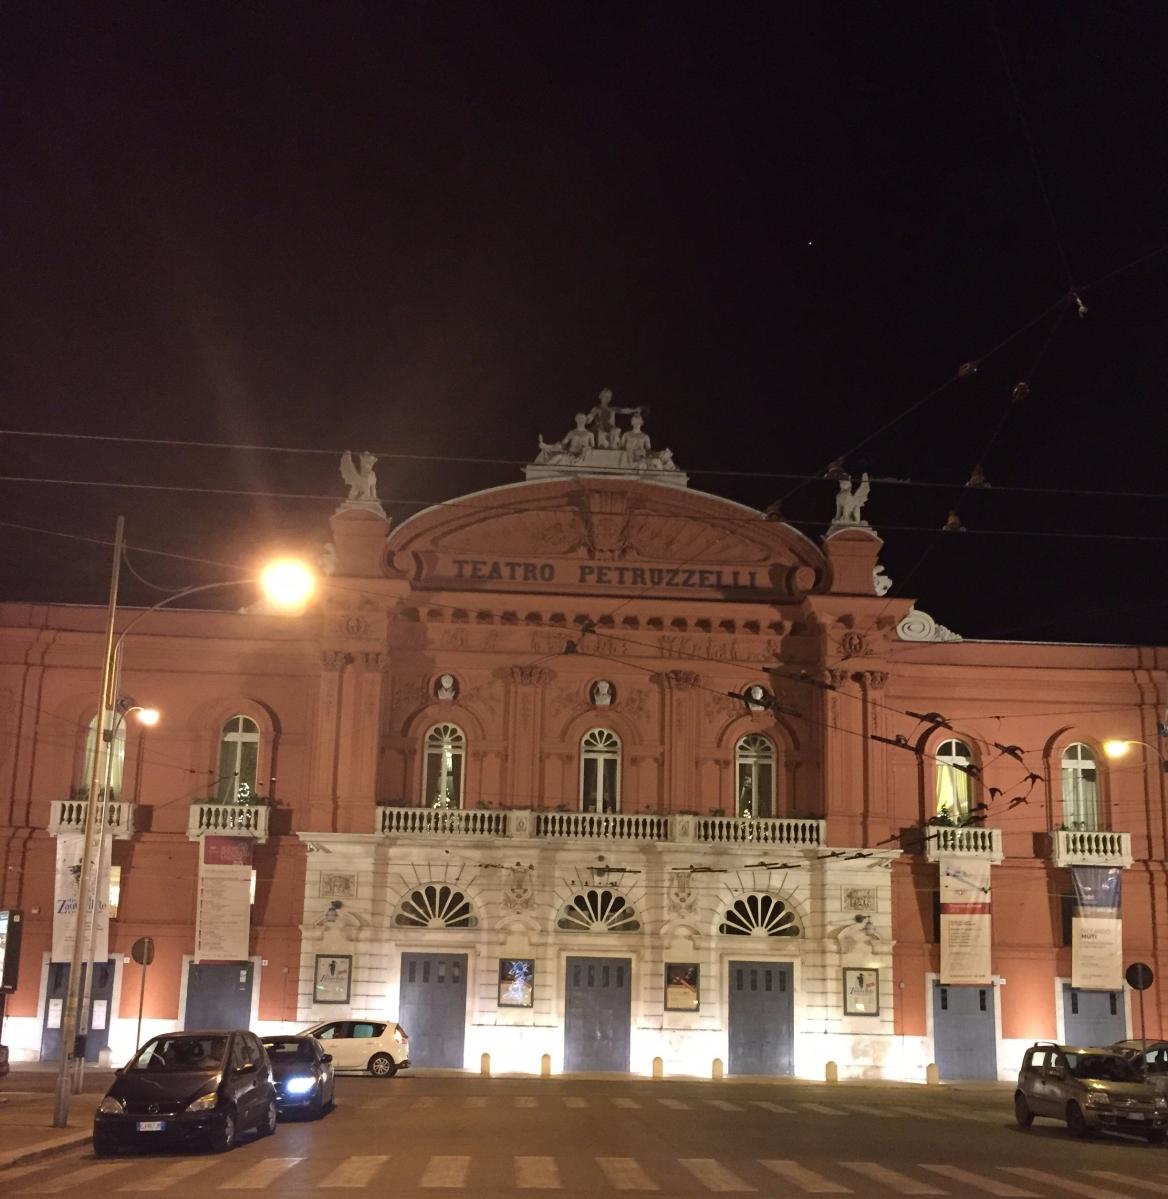 Teatro Petruzzelli, Bari 🏛🎶🇮🇹